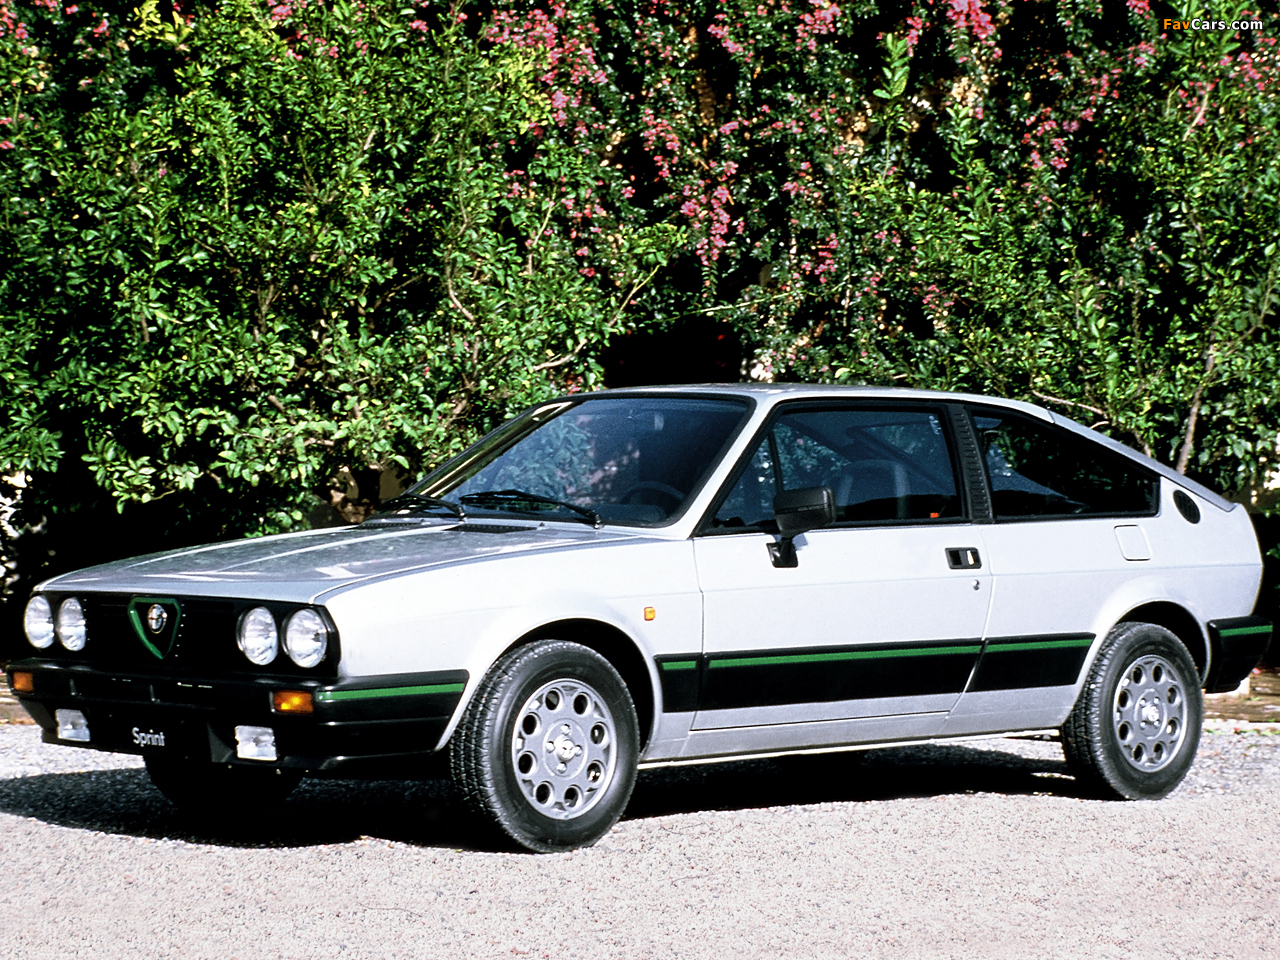 Alfa-romeo_sprint_1983_pictures_3.jpg